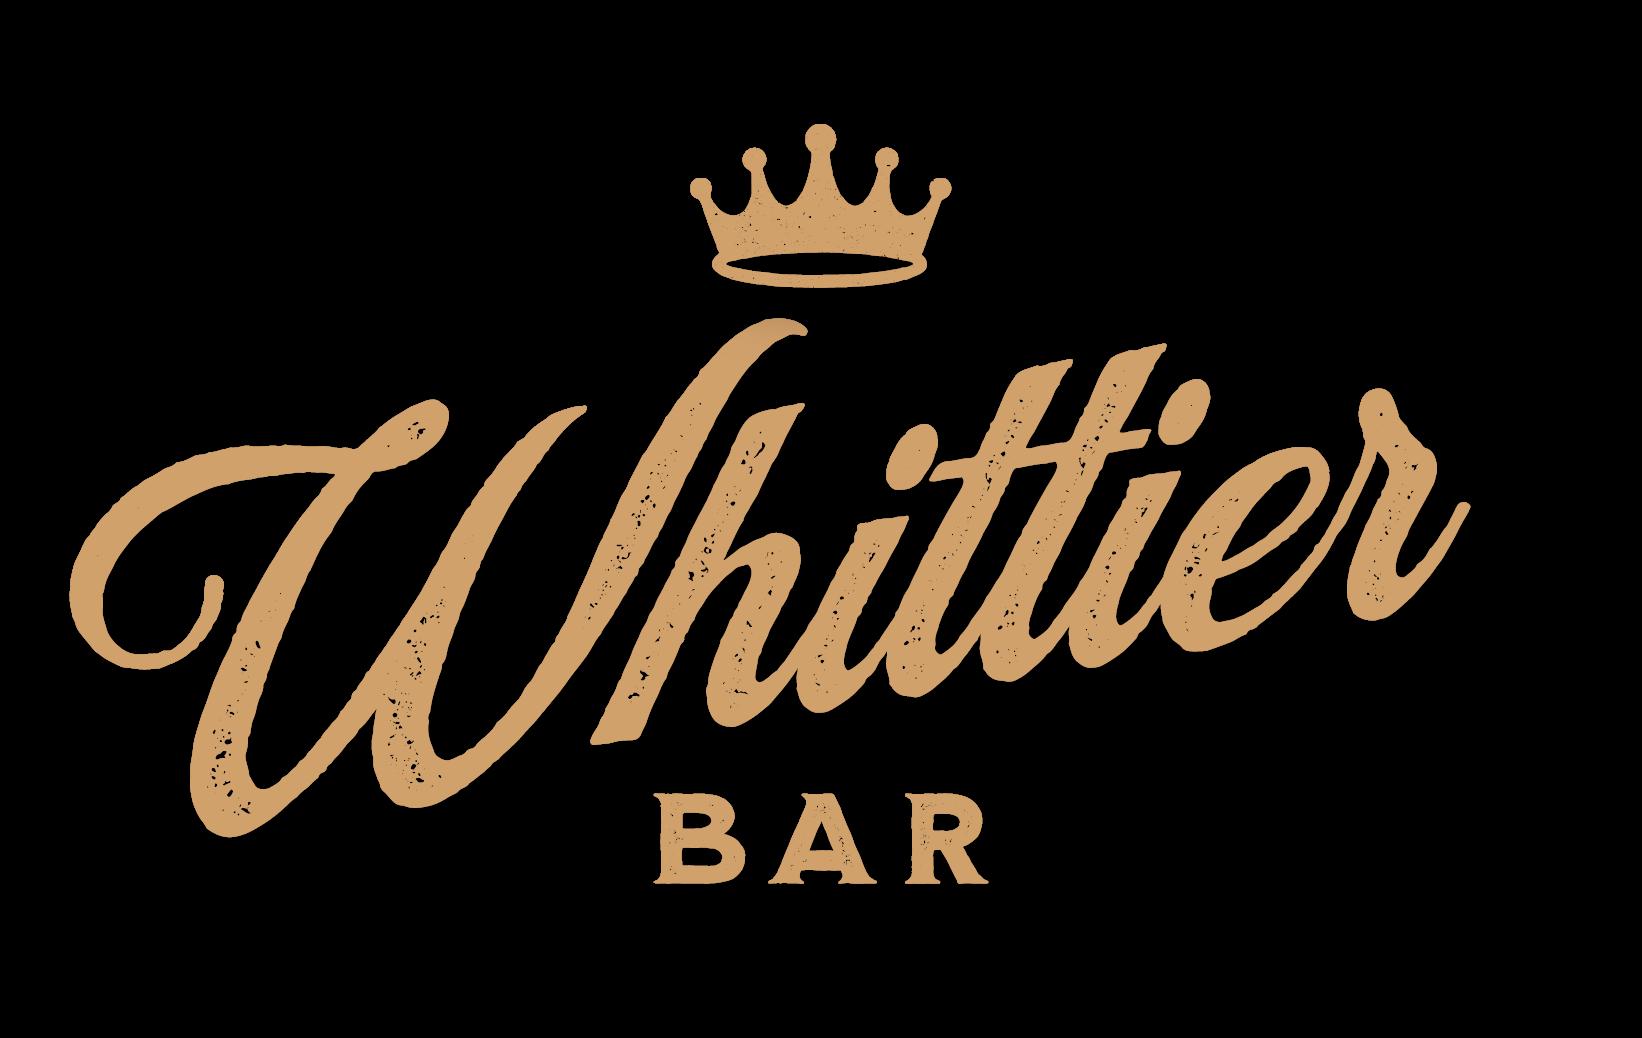 whittierBar-shadow.png